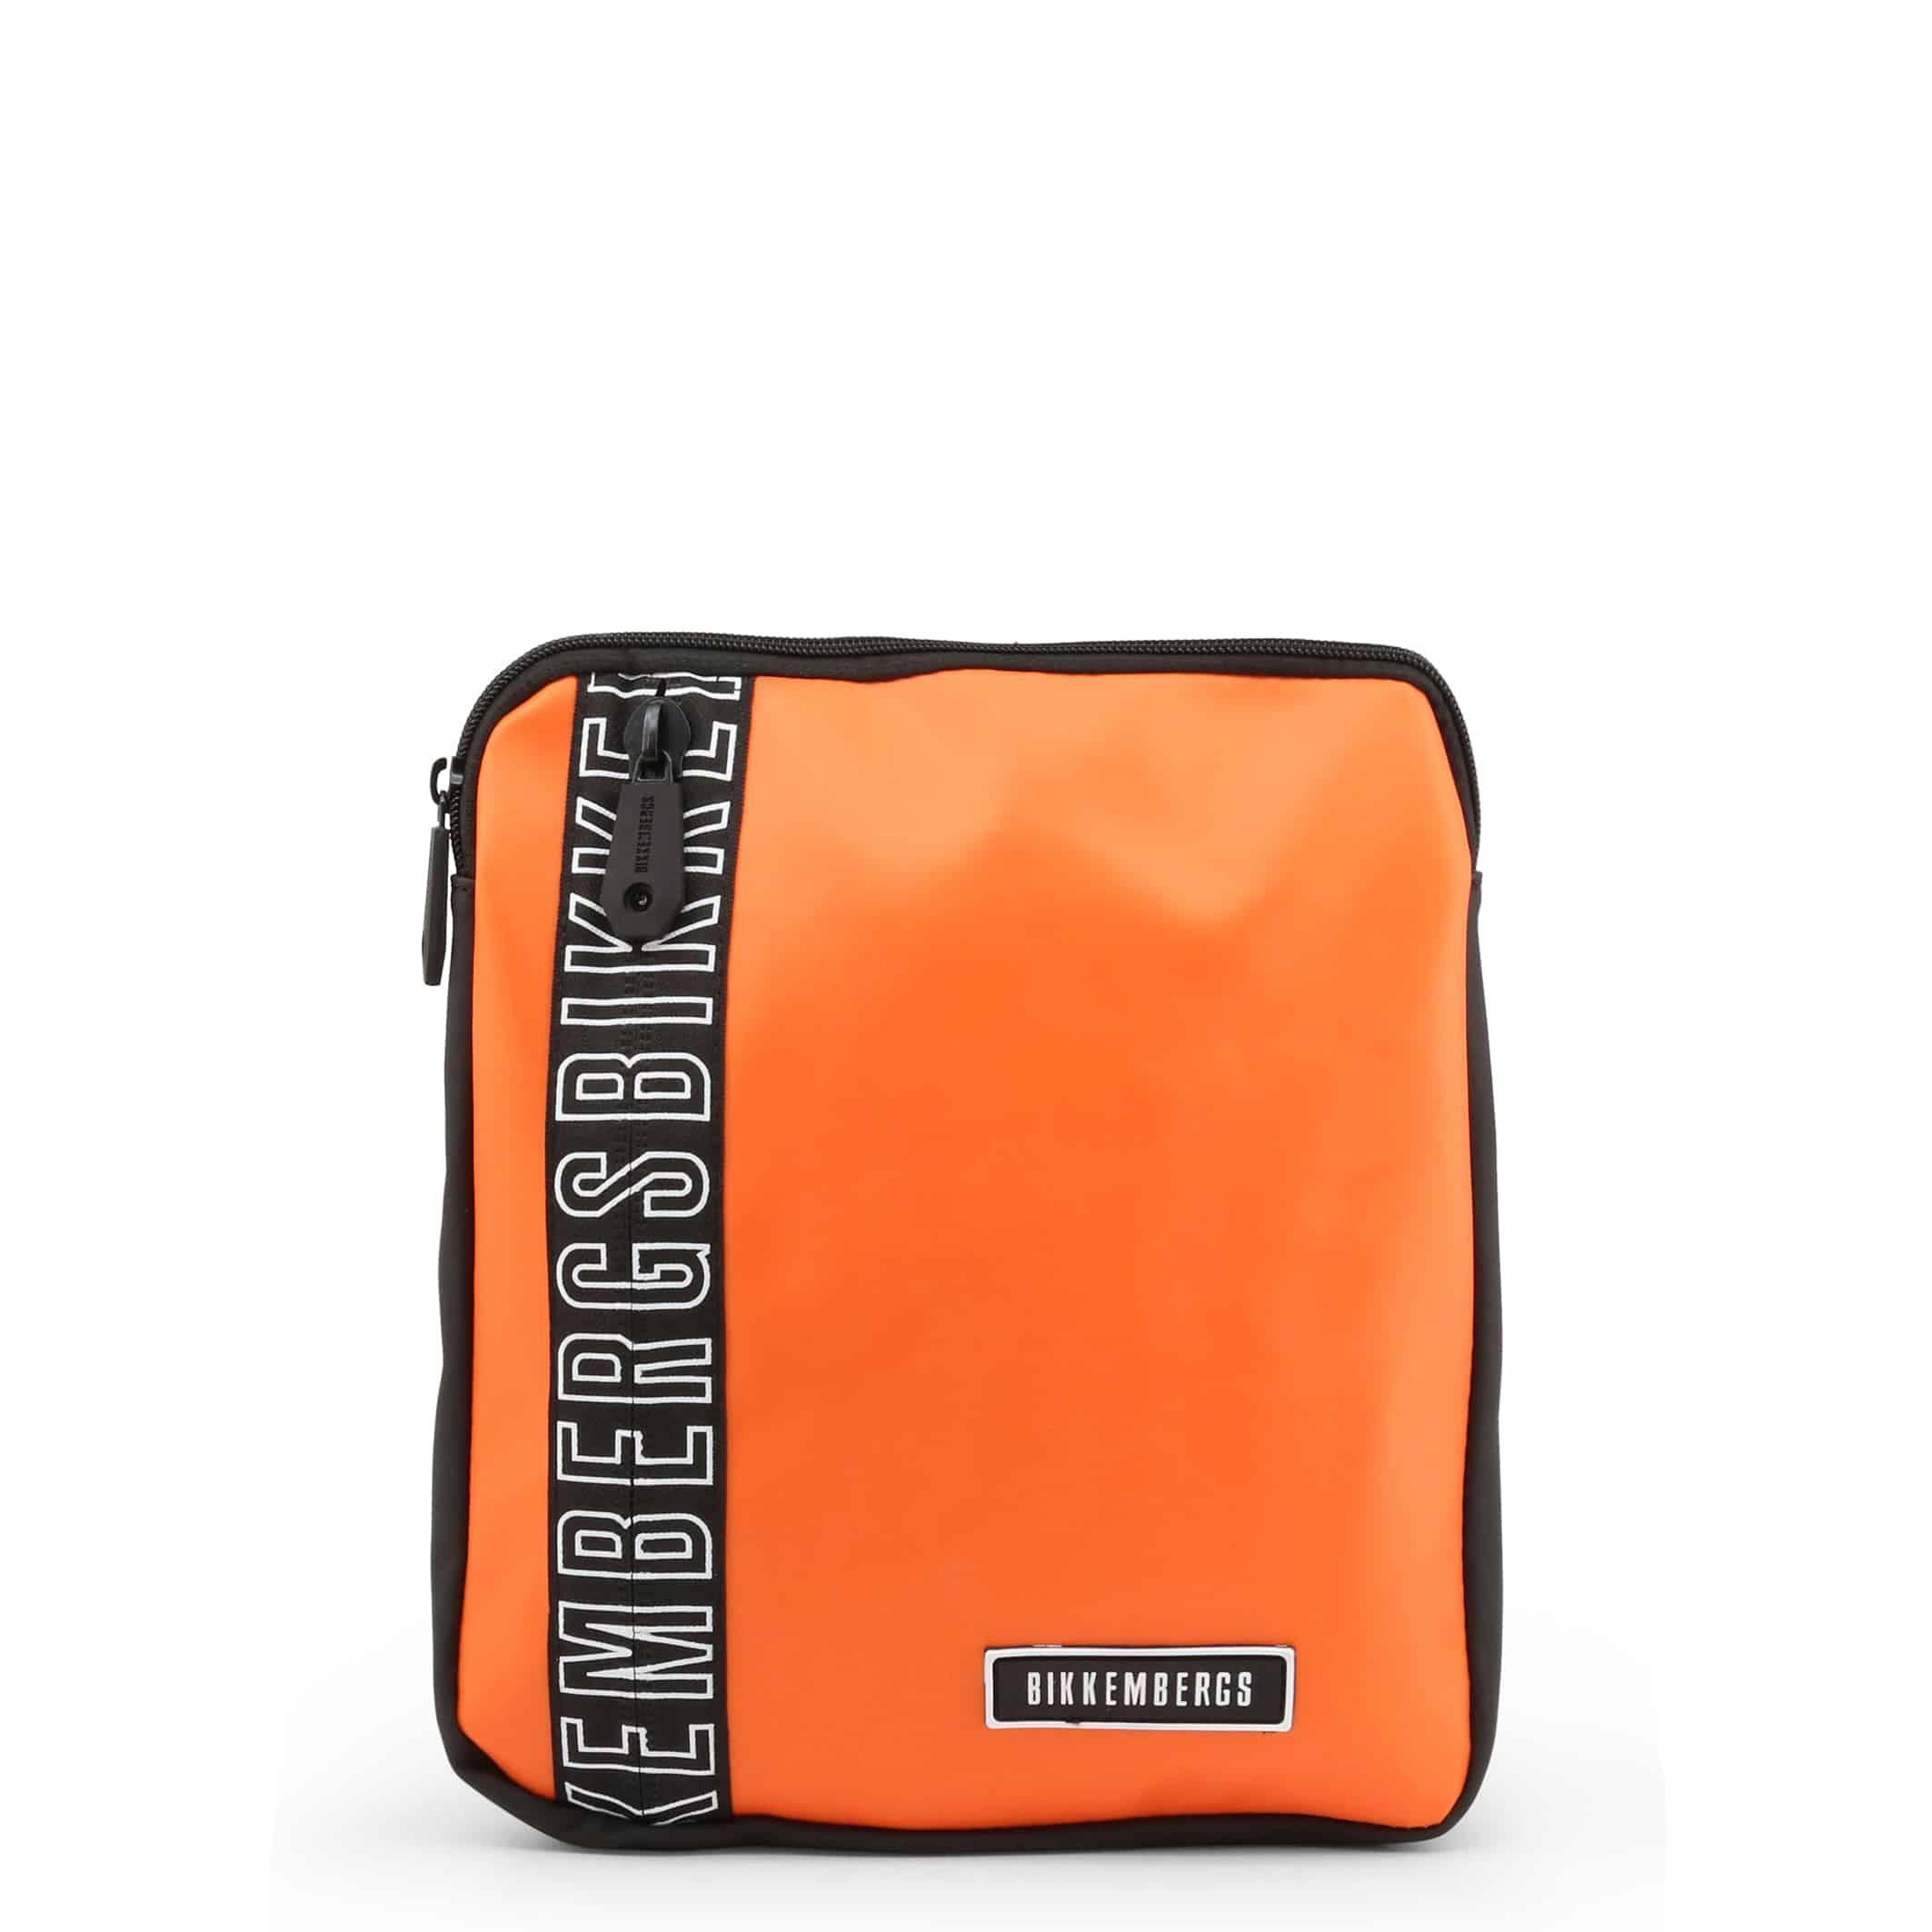 Bikkembergs – E2APME170032 – Oranje Designeritems.nl